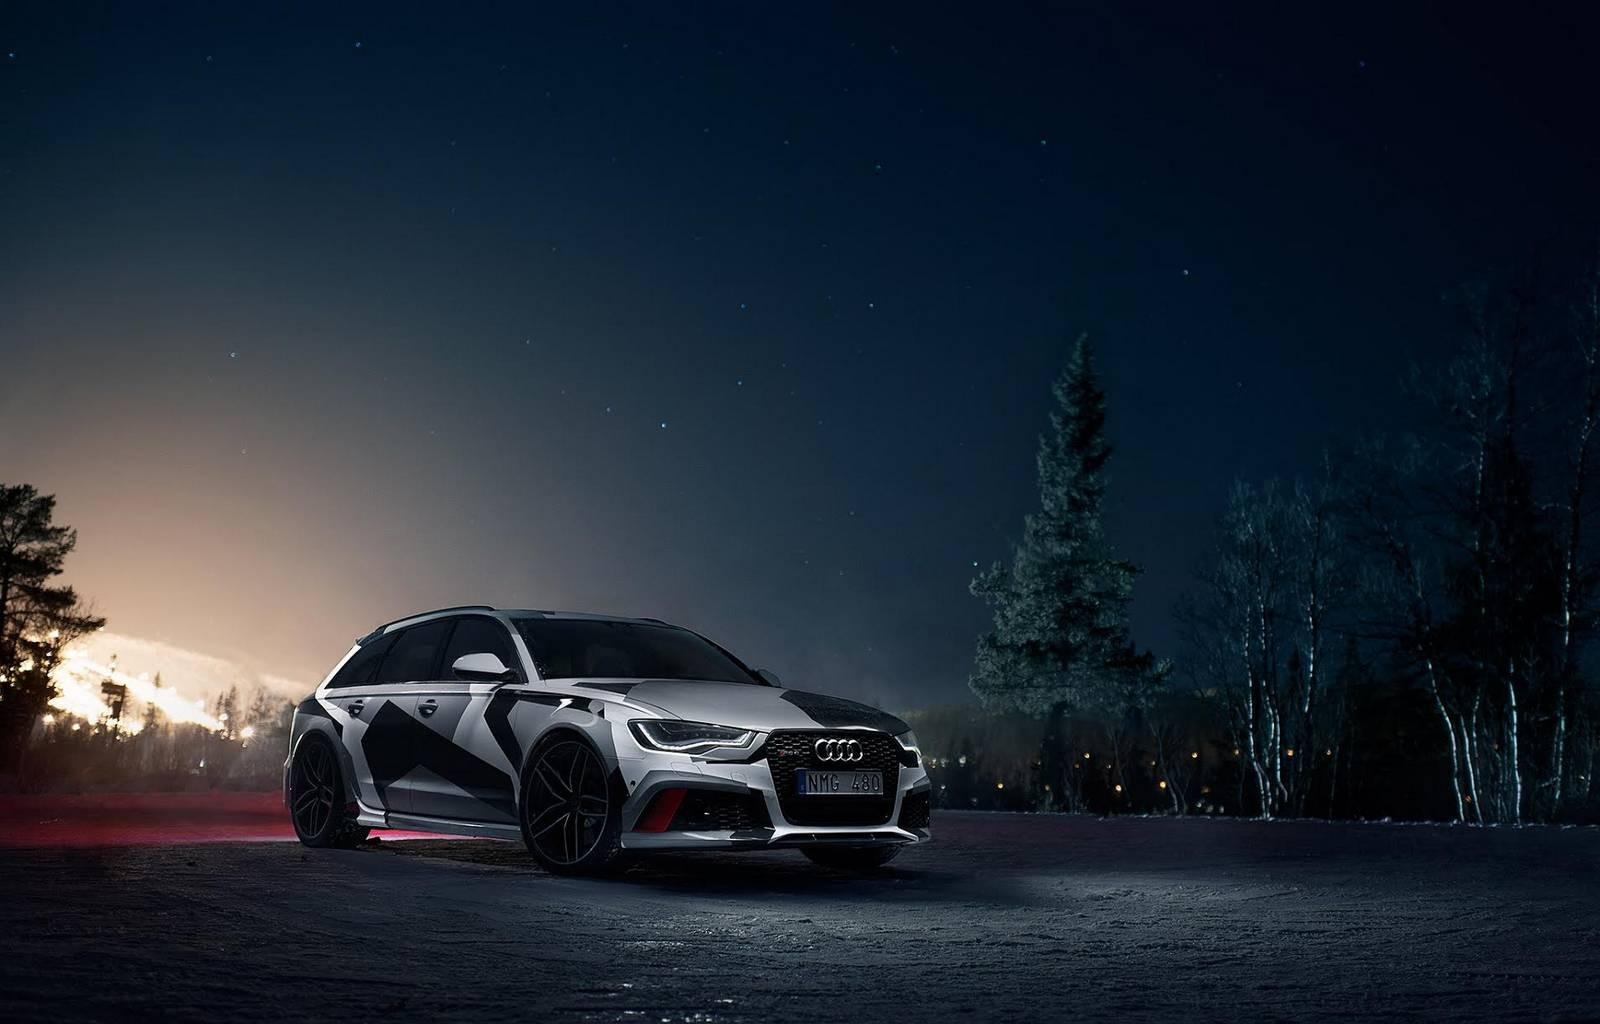 Wallpaper 1600x1024 Px Audi Quattro Audi Rs4 Avant Audi Rs6